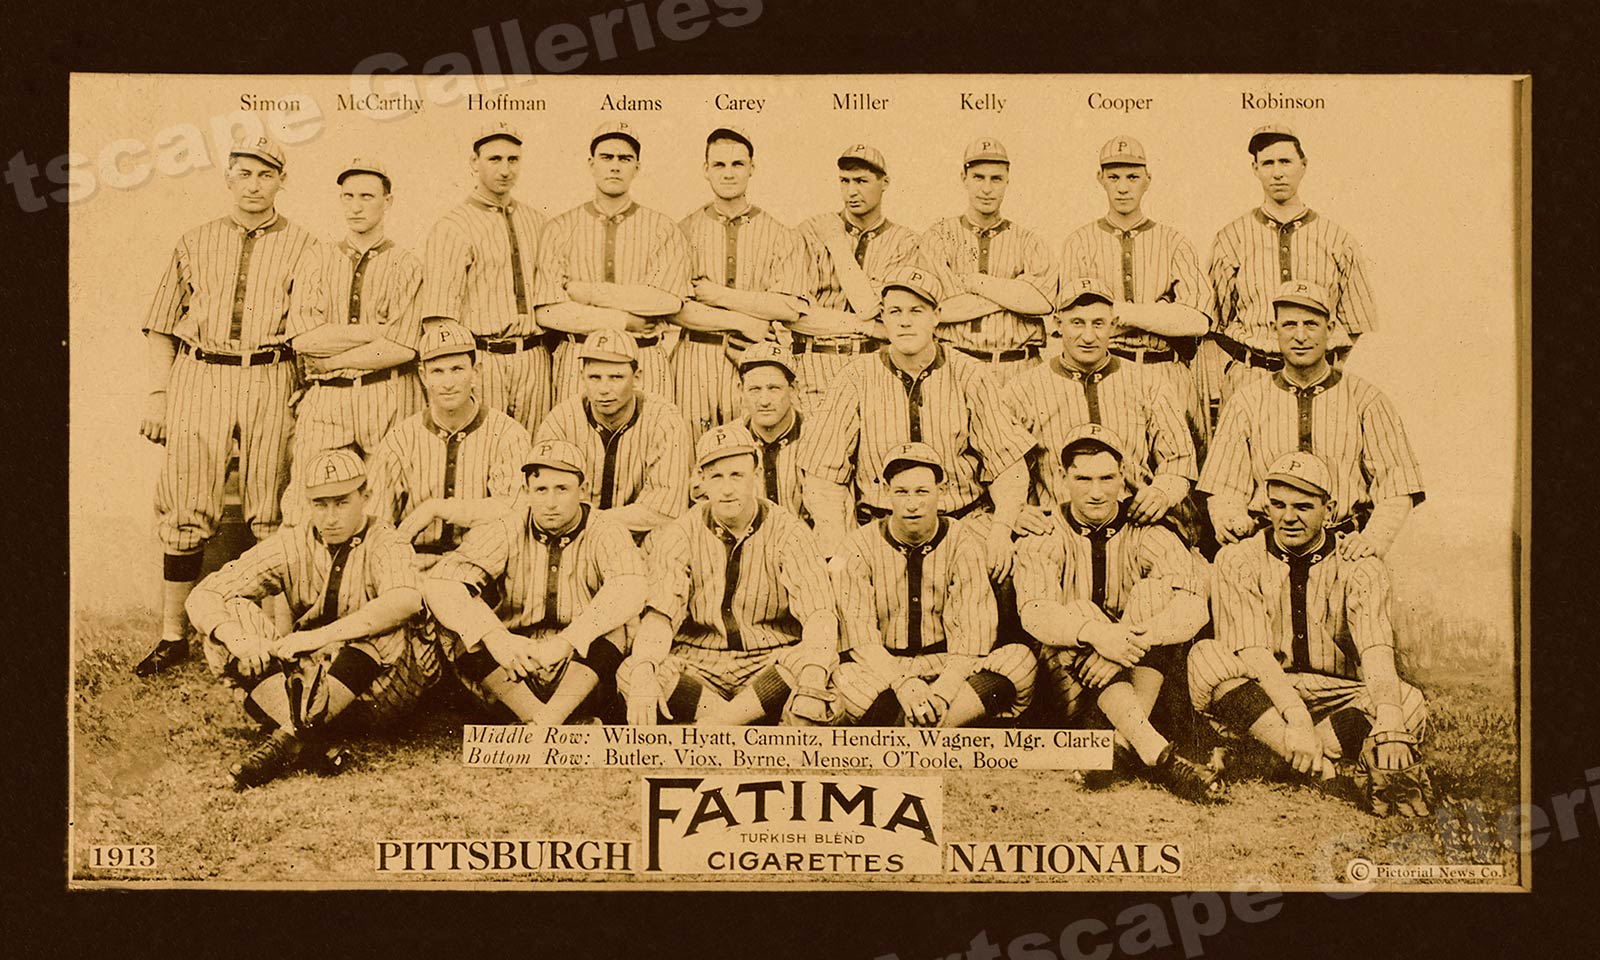 1913 Pittsburgh Pirates Classic Baseball Team Photo Poster 12x20